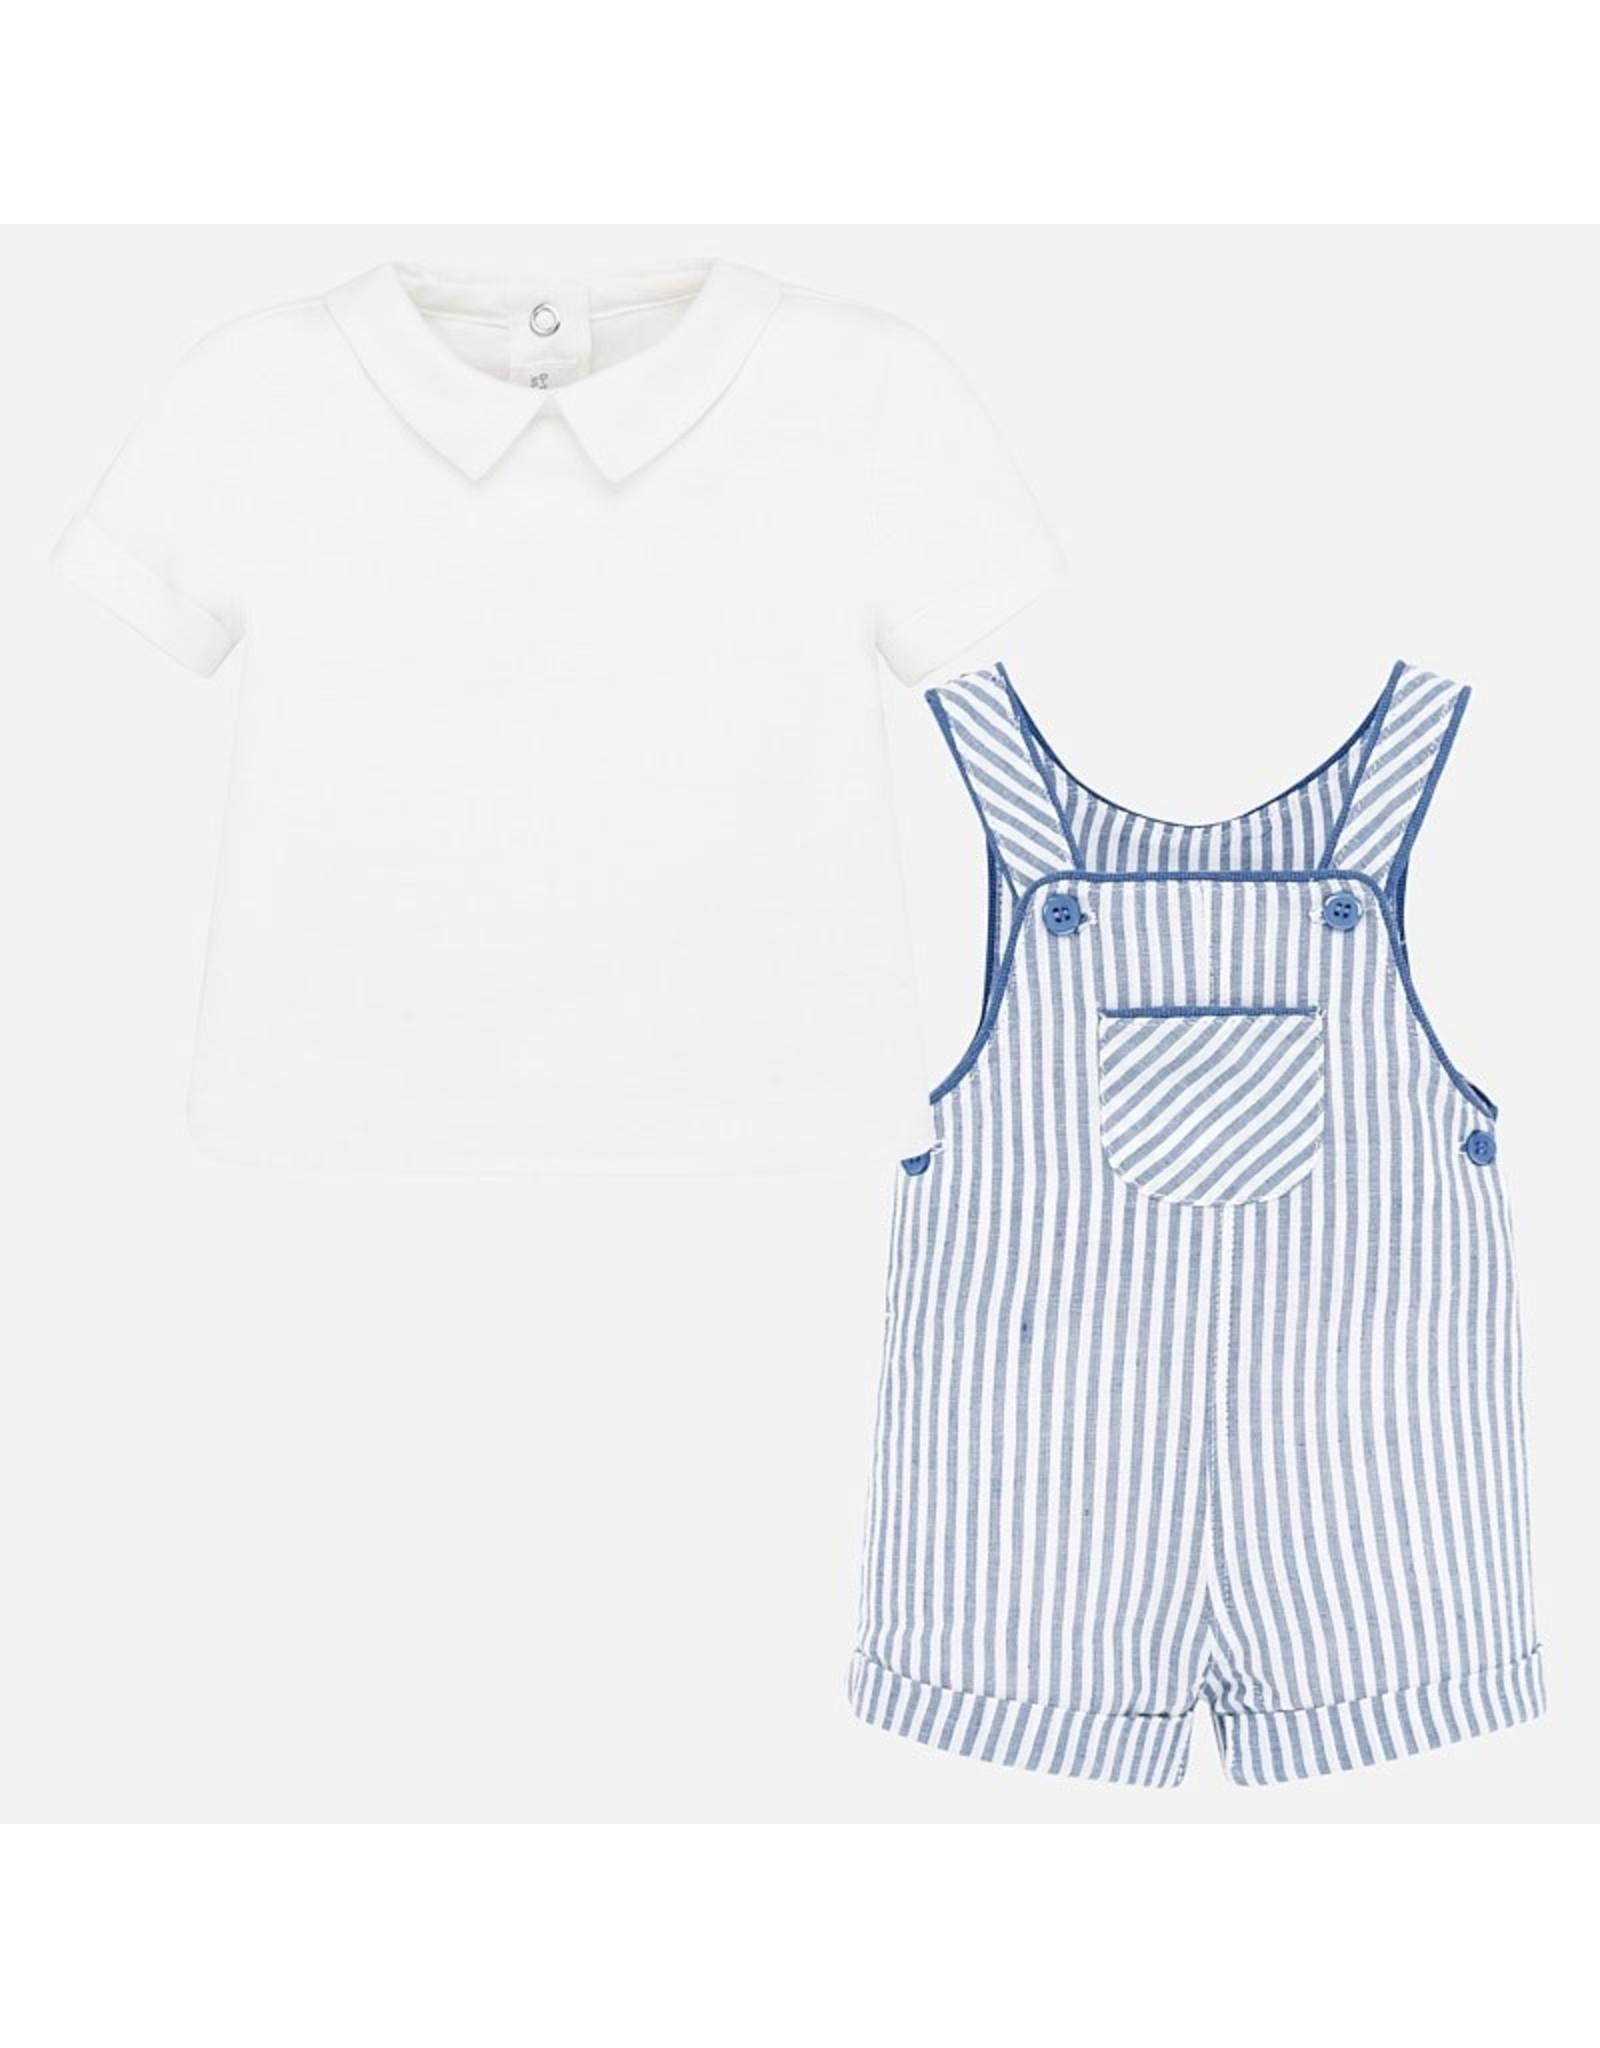 Mayoral Peto and Shirt Set